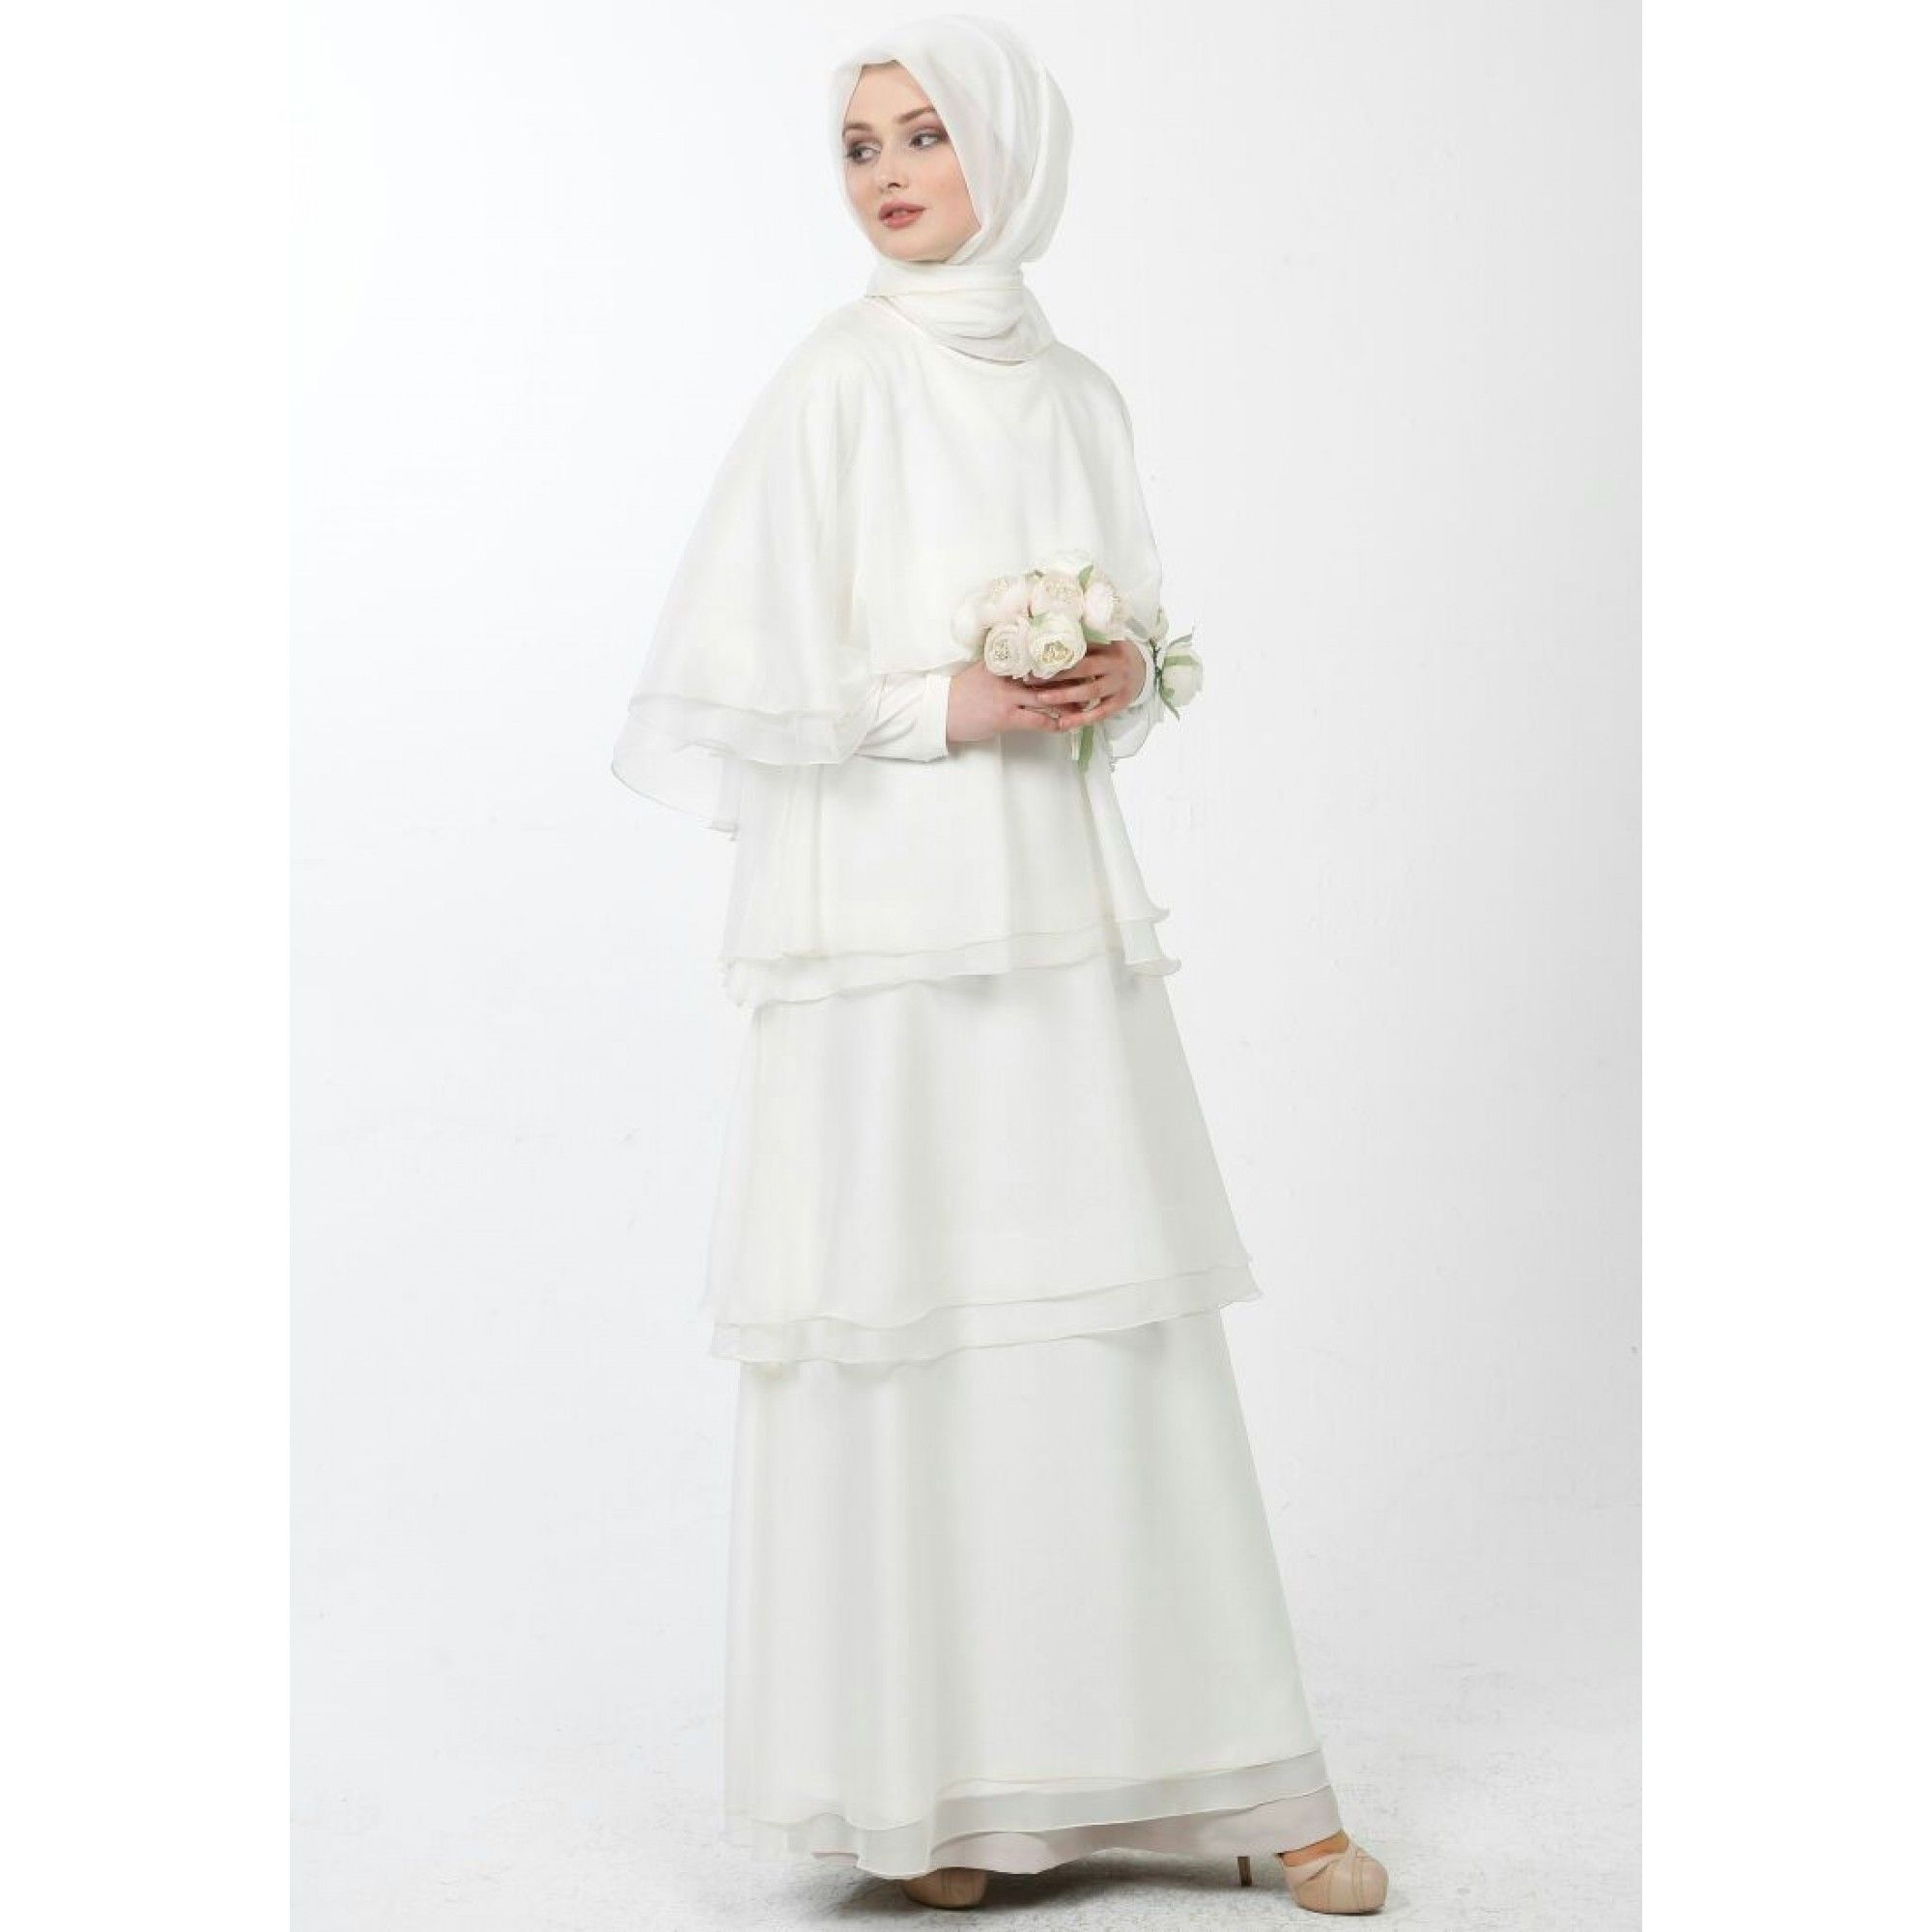 Tesettur Kat Kat Beyaz Elbise Modelleri Elbise Modelleri Elbise The Dress